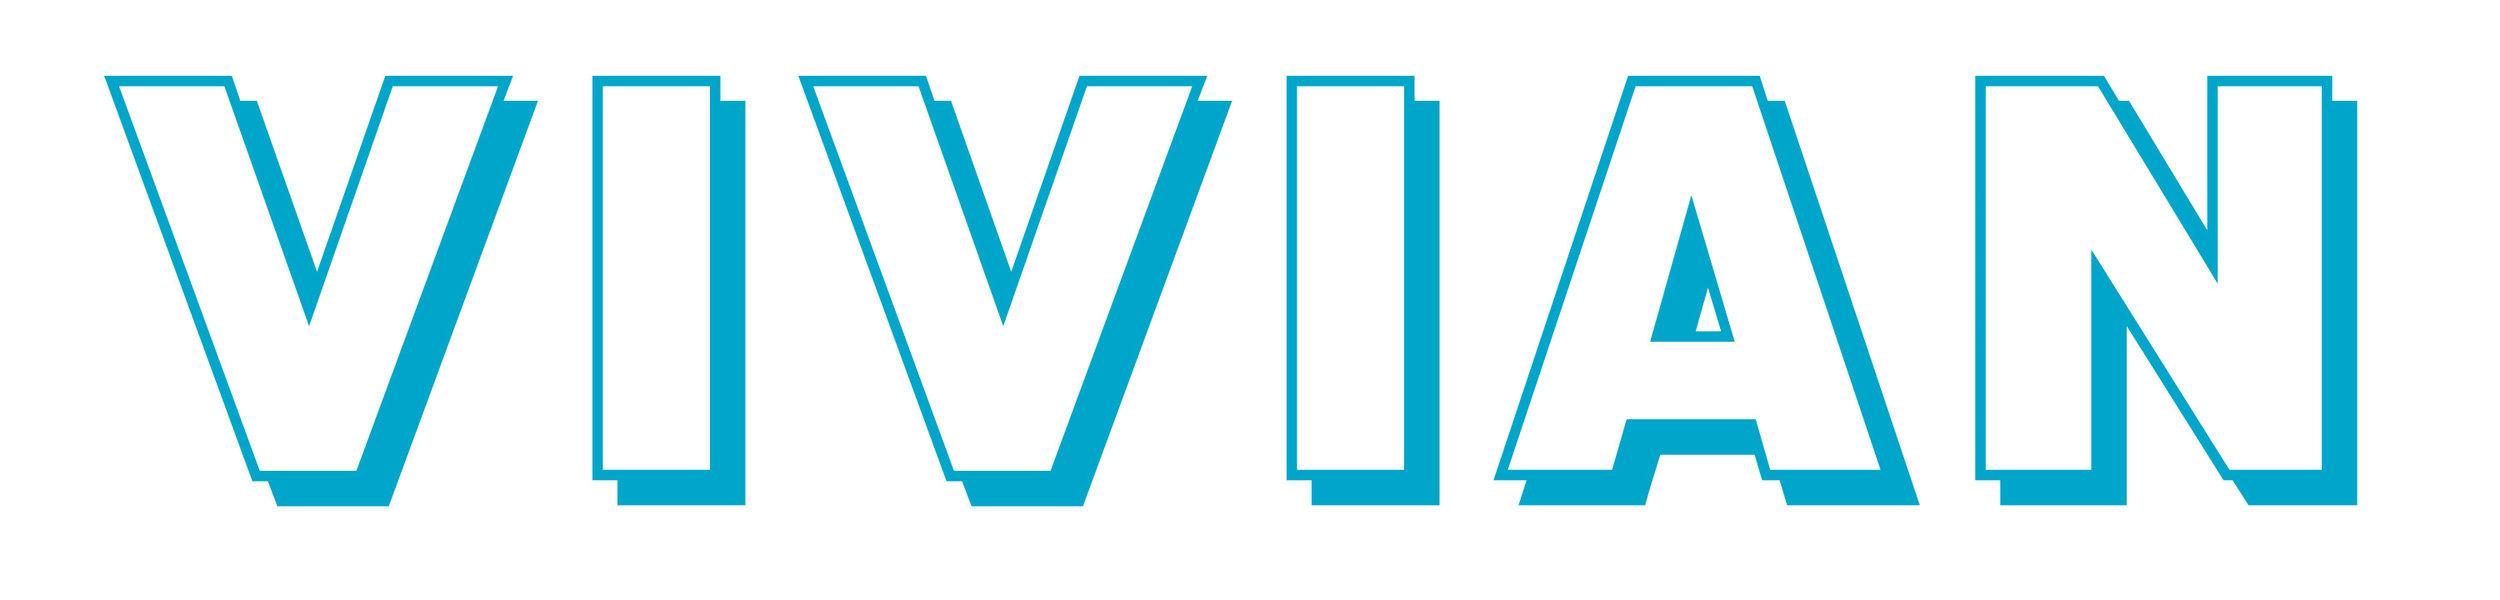 vivian 3.jpeg